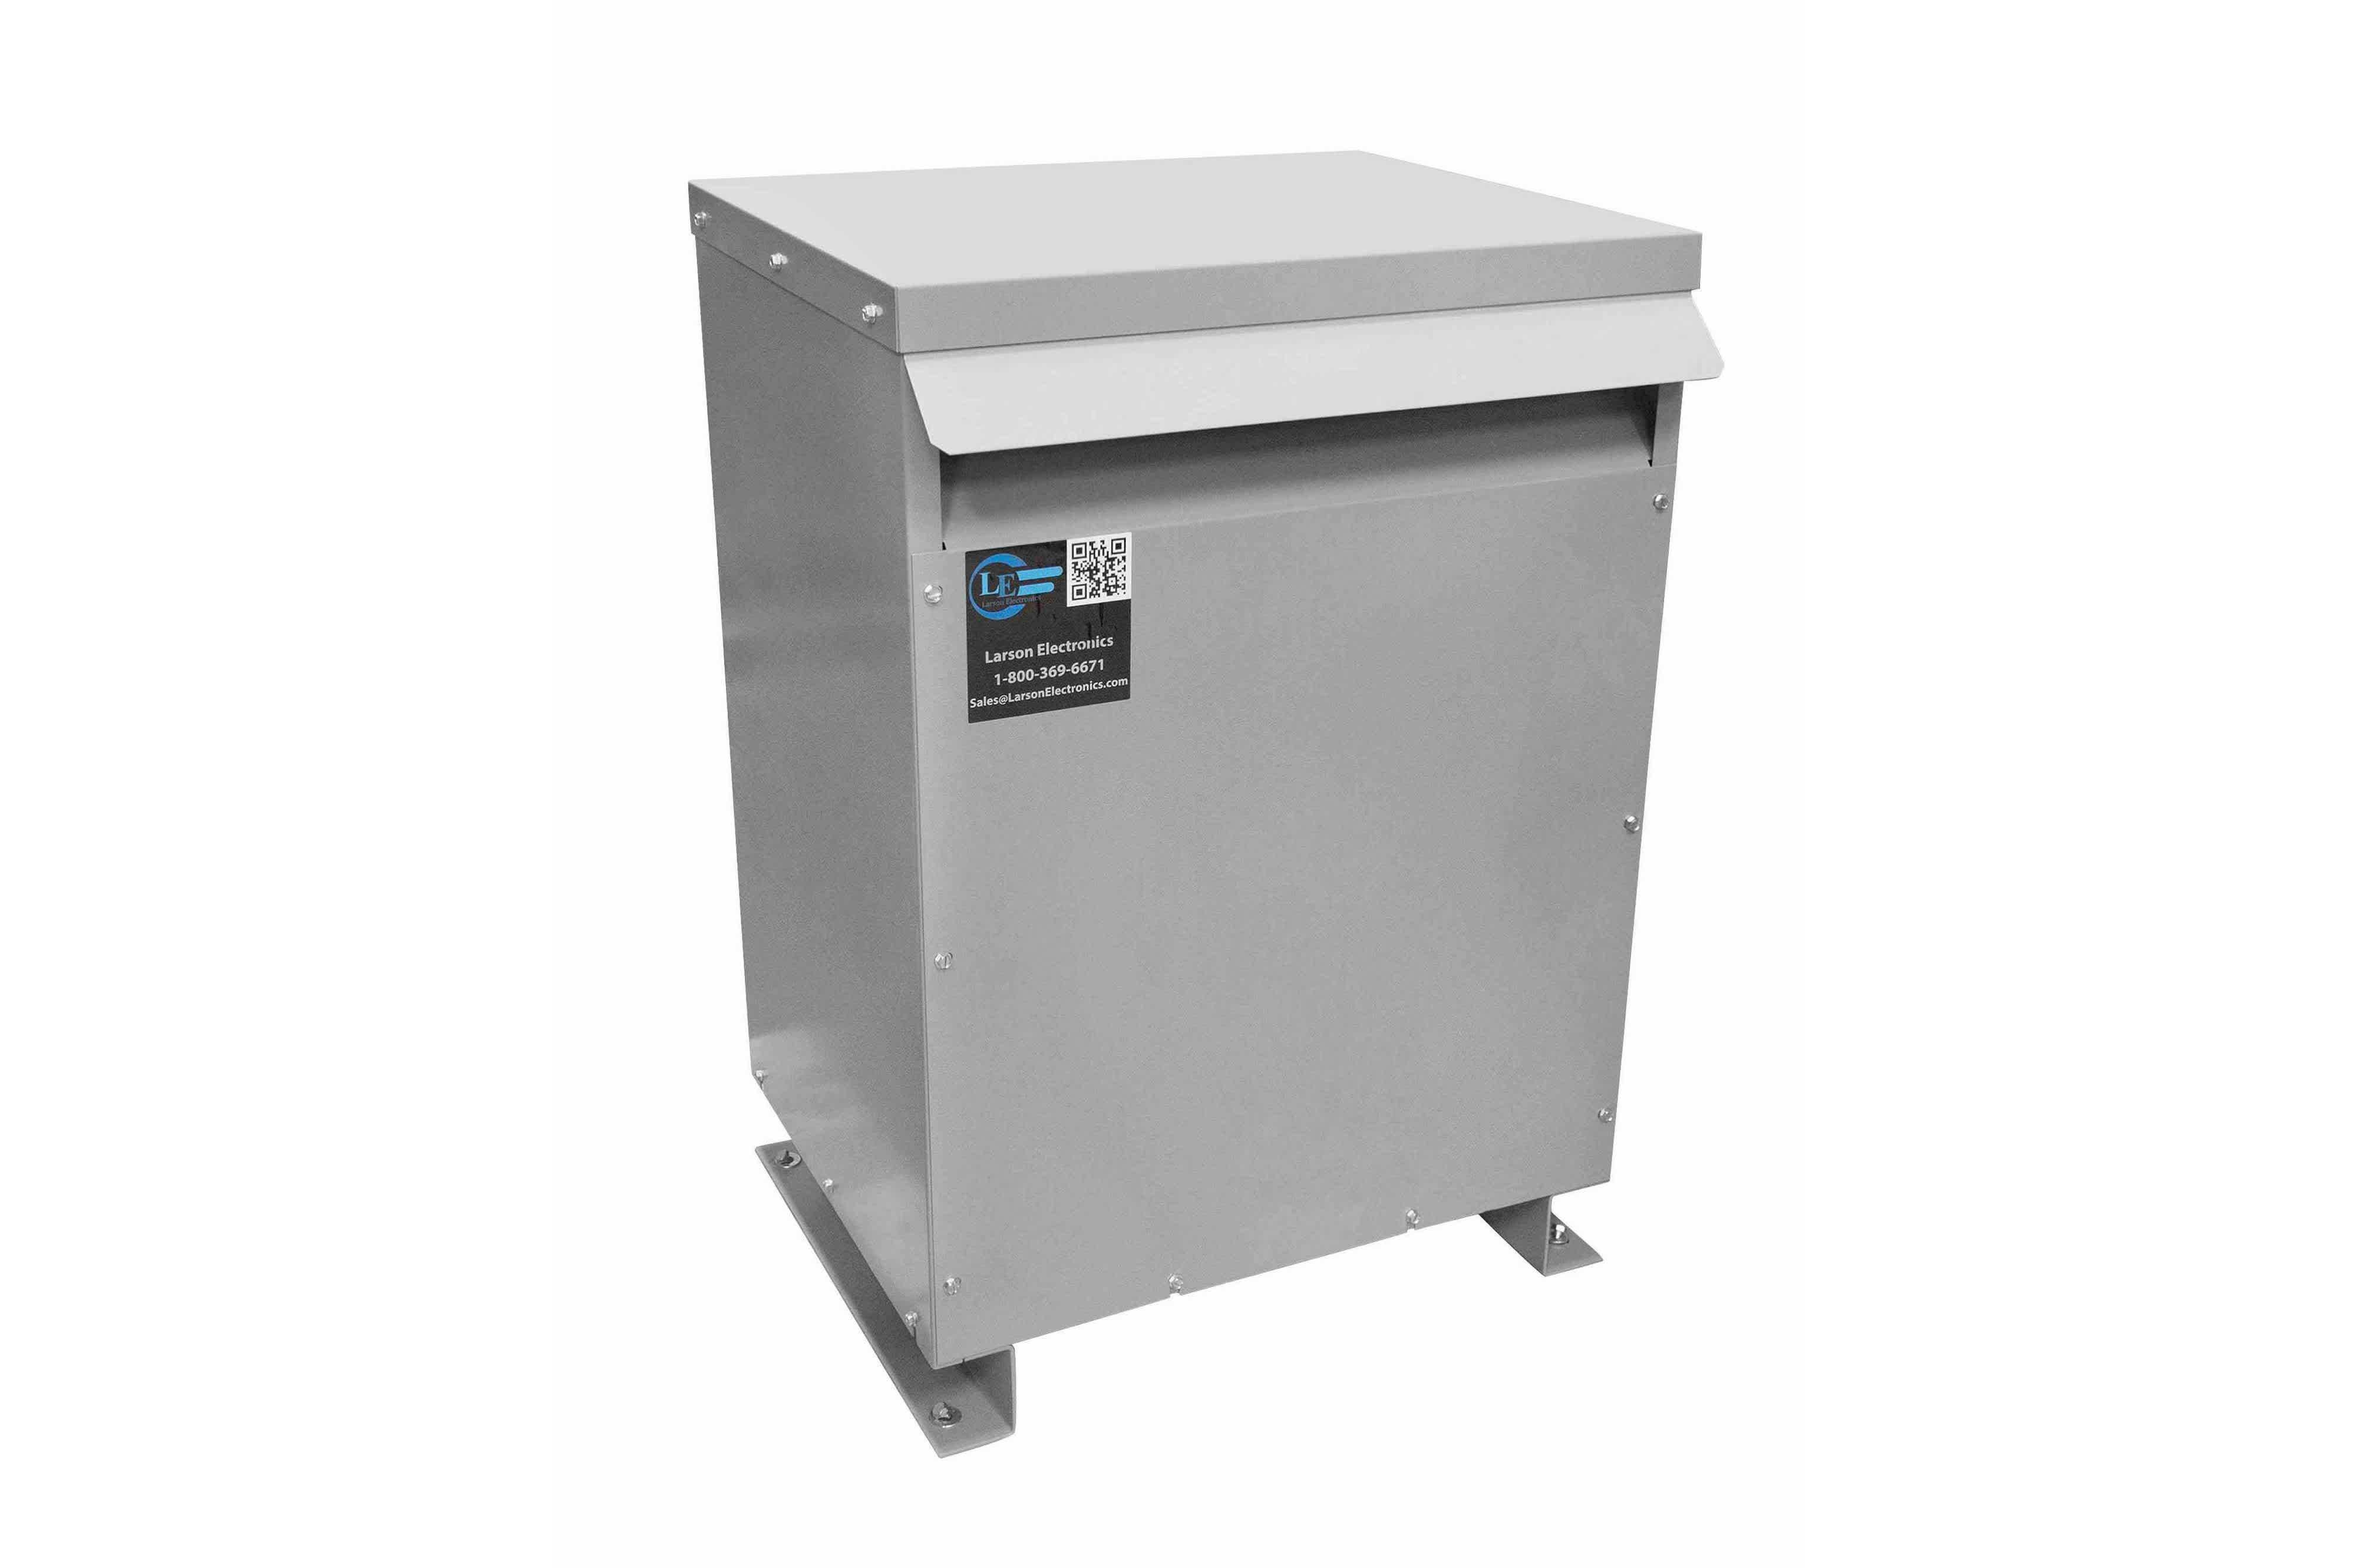 12 kVA 3PH DOE Transformer, 208V Delta Primary, 380Y/220 Wye-N Secondary, N3R, Ventilated, 60 Hz